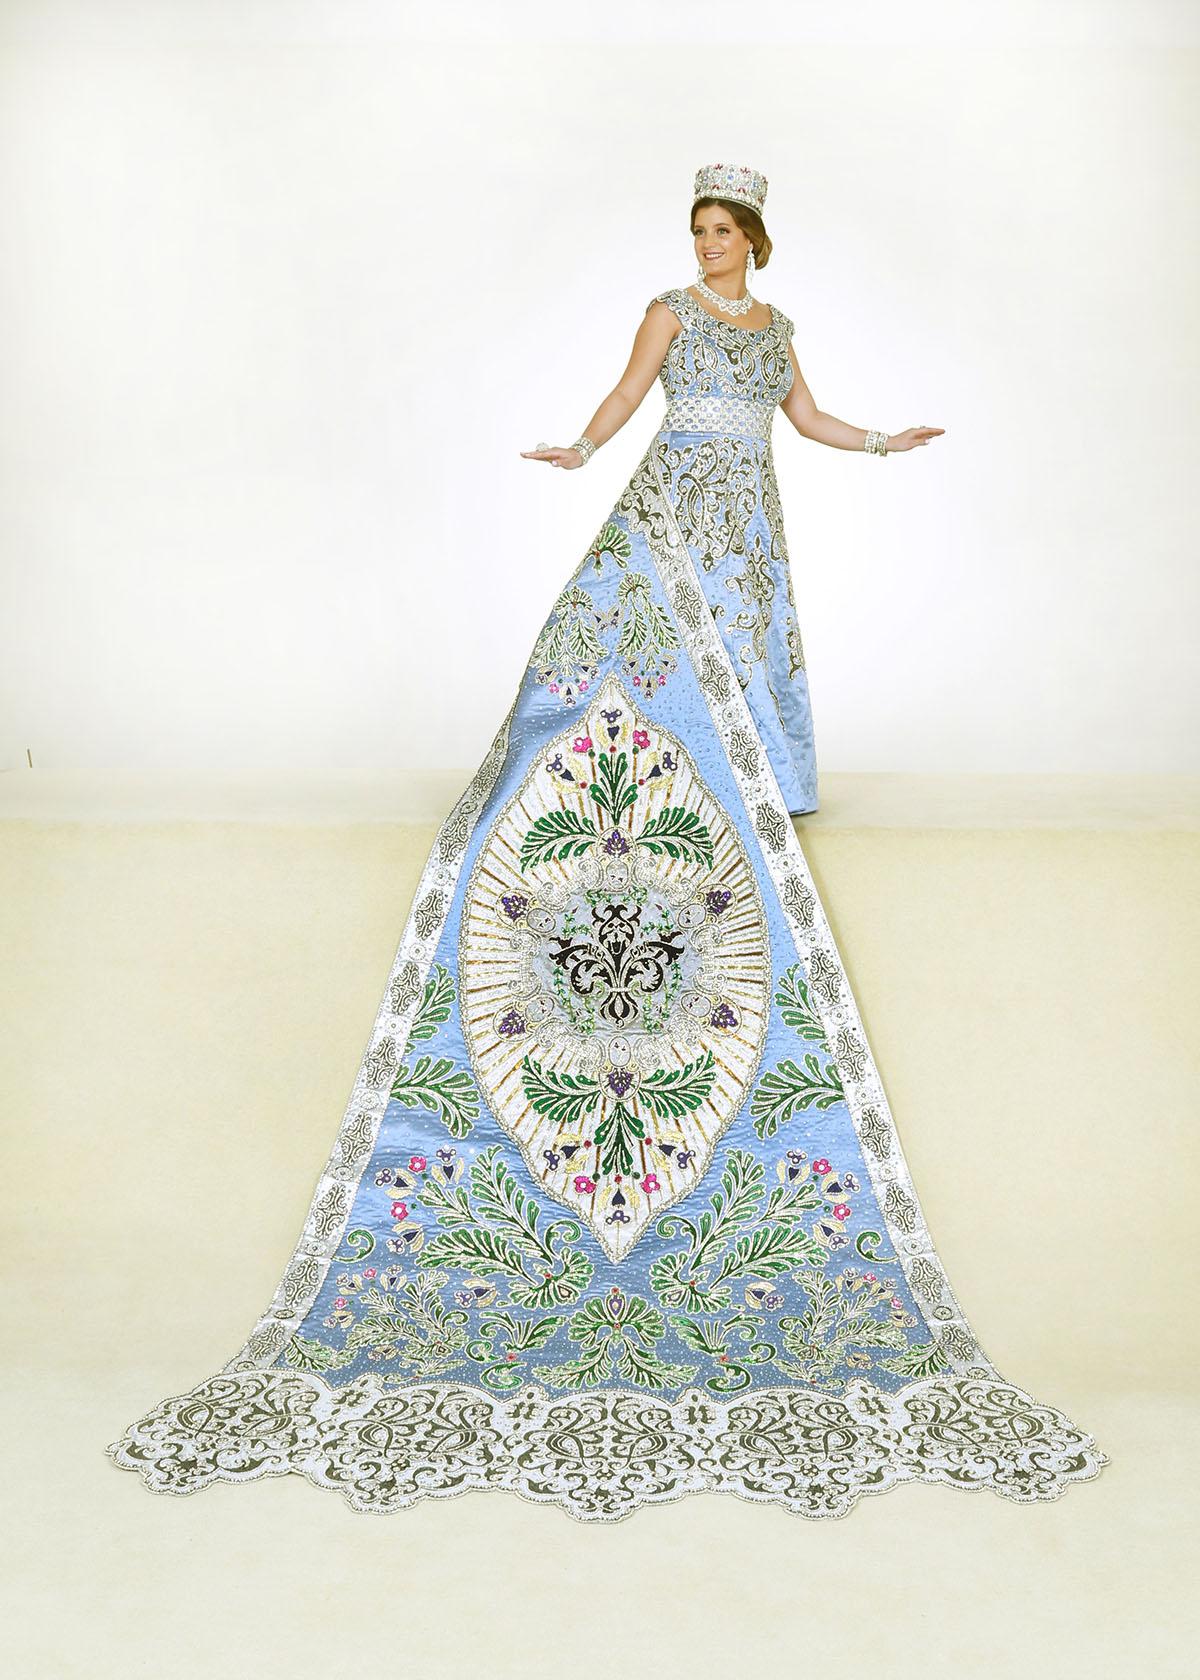 Olivia Garcia, Duchess Of The Verdant Gardens Of New Orleans